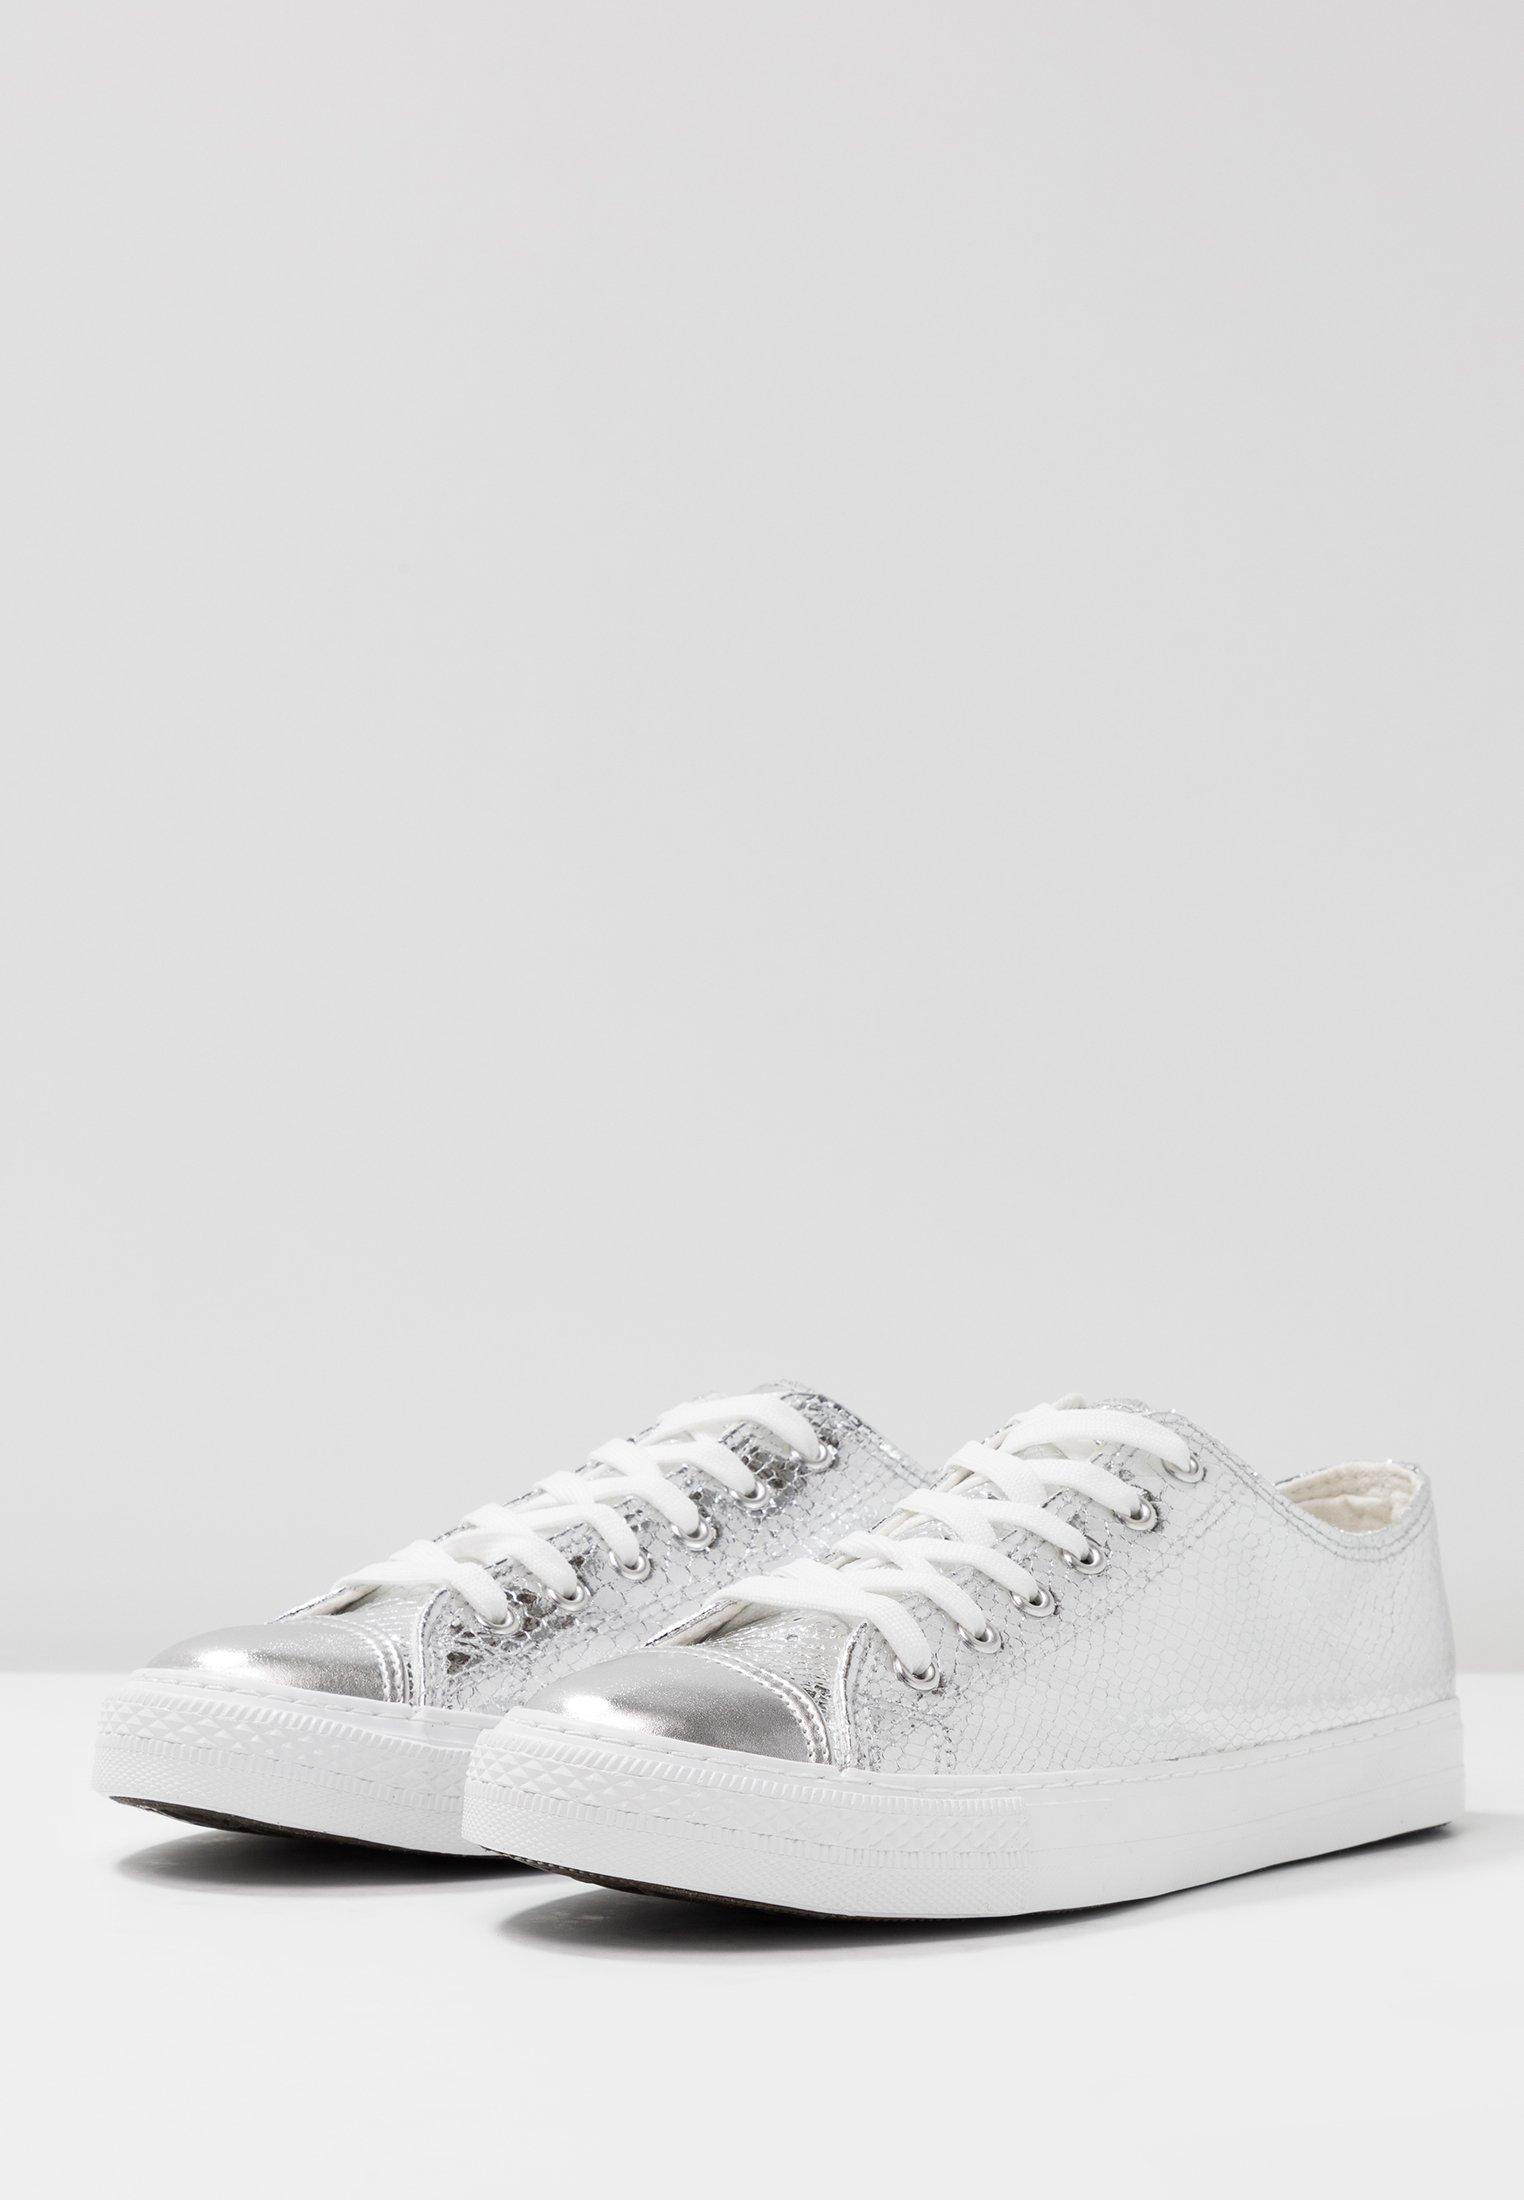 CARRIE Sneakers silber